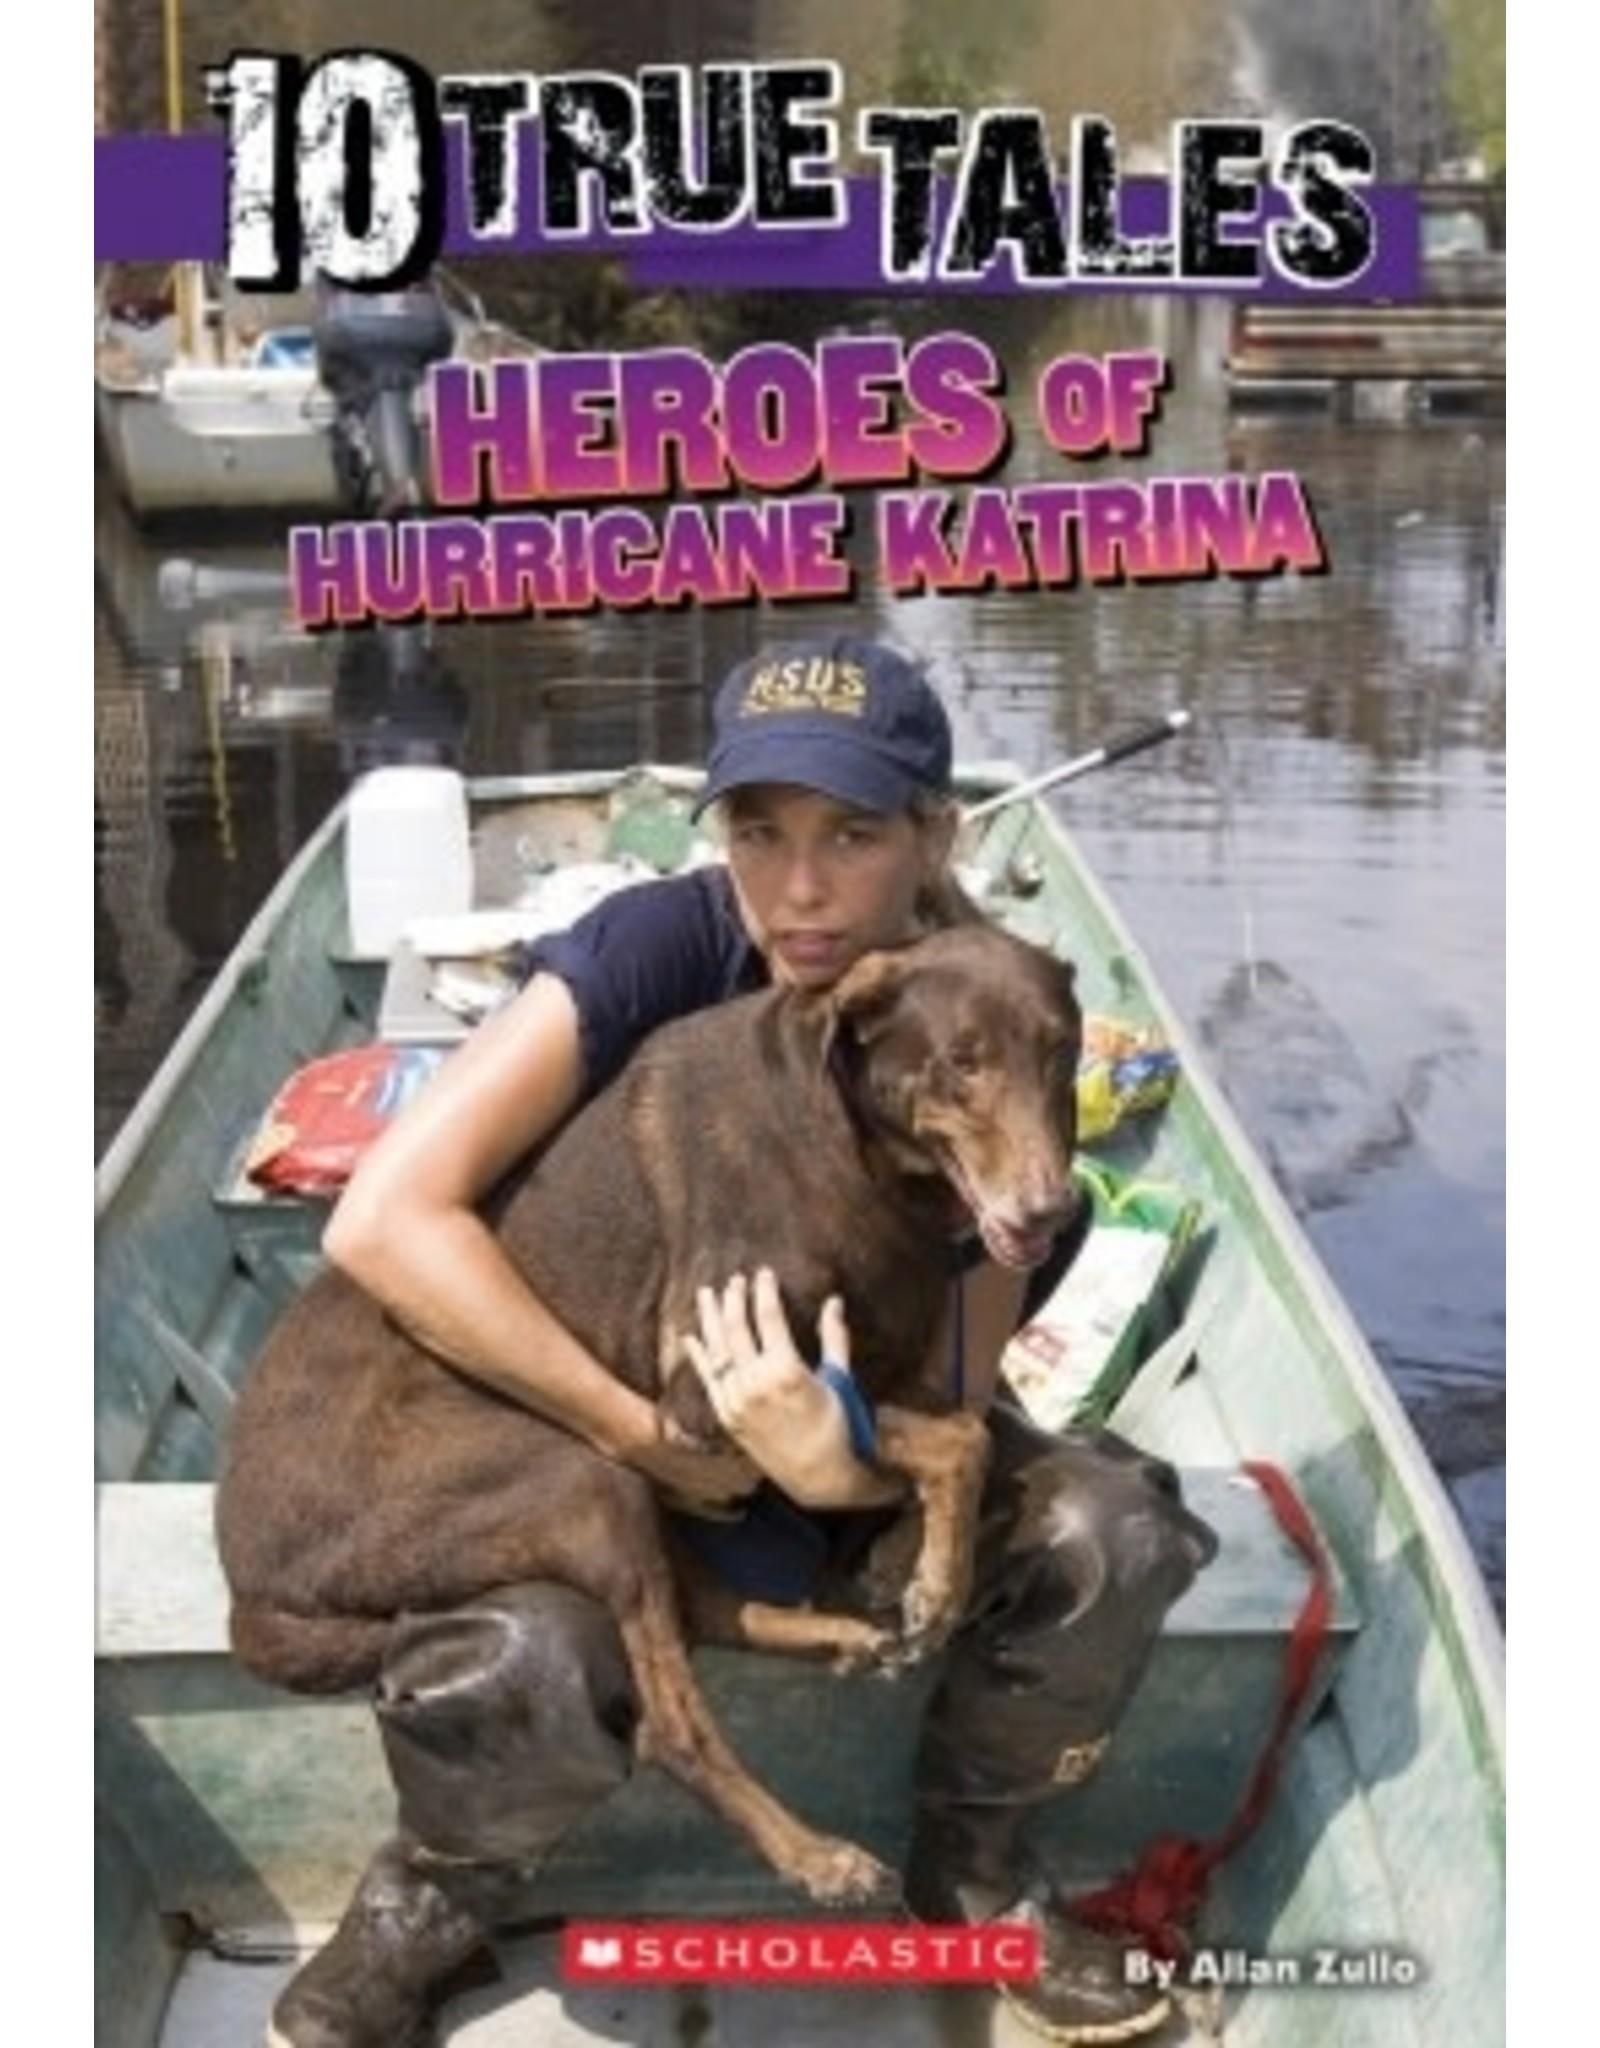 Scholastic 10 True Tales: Heroes of Hurricane Katrina